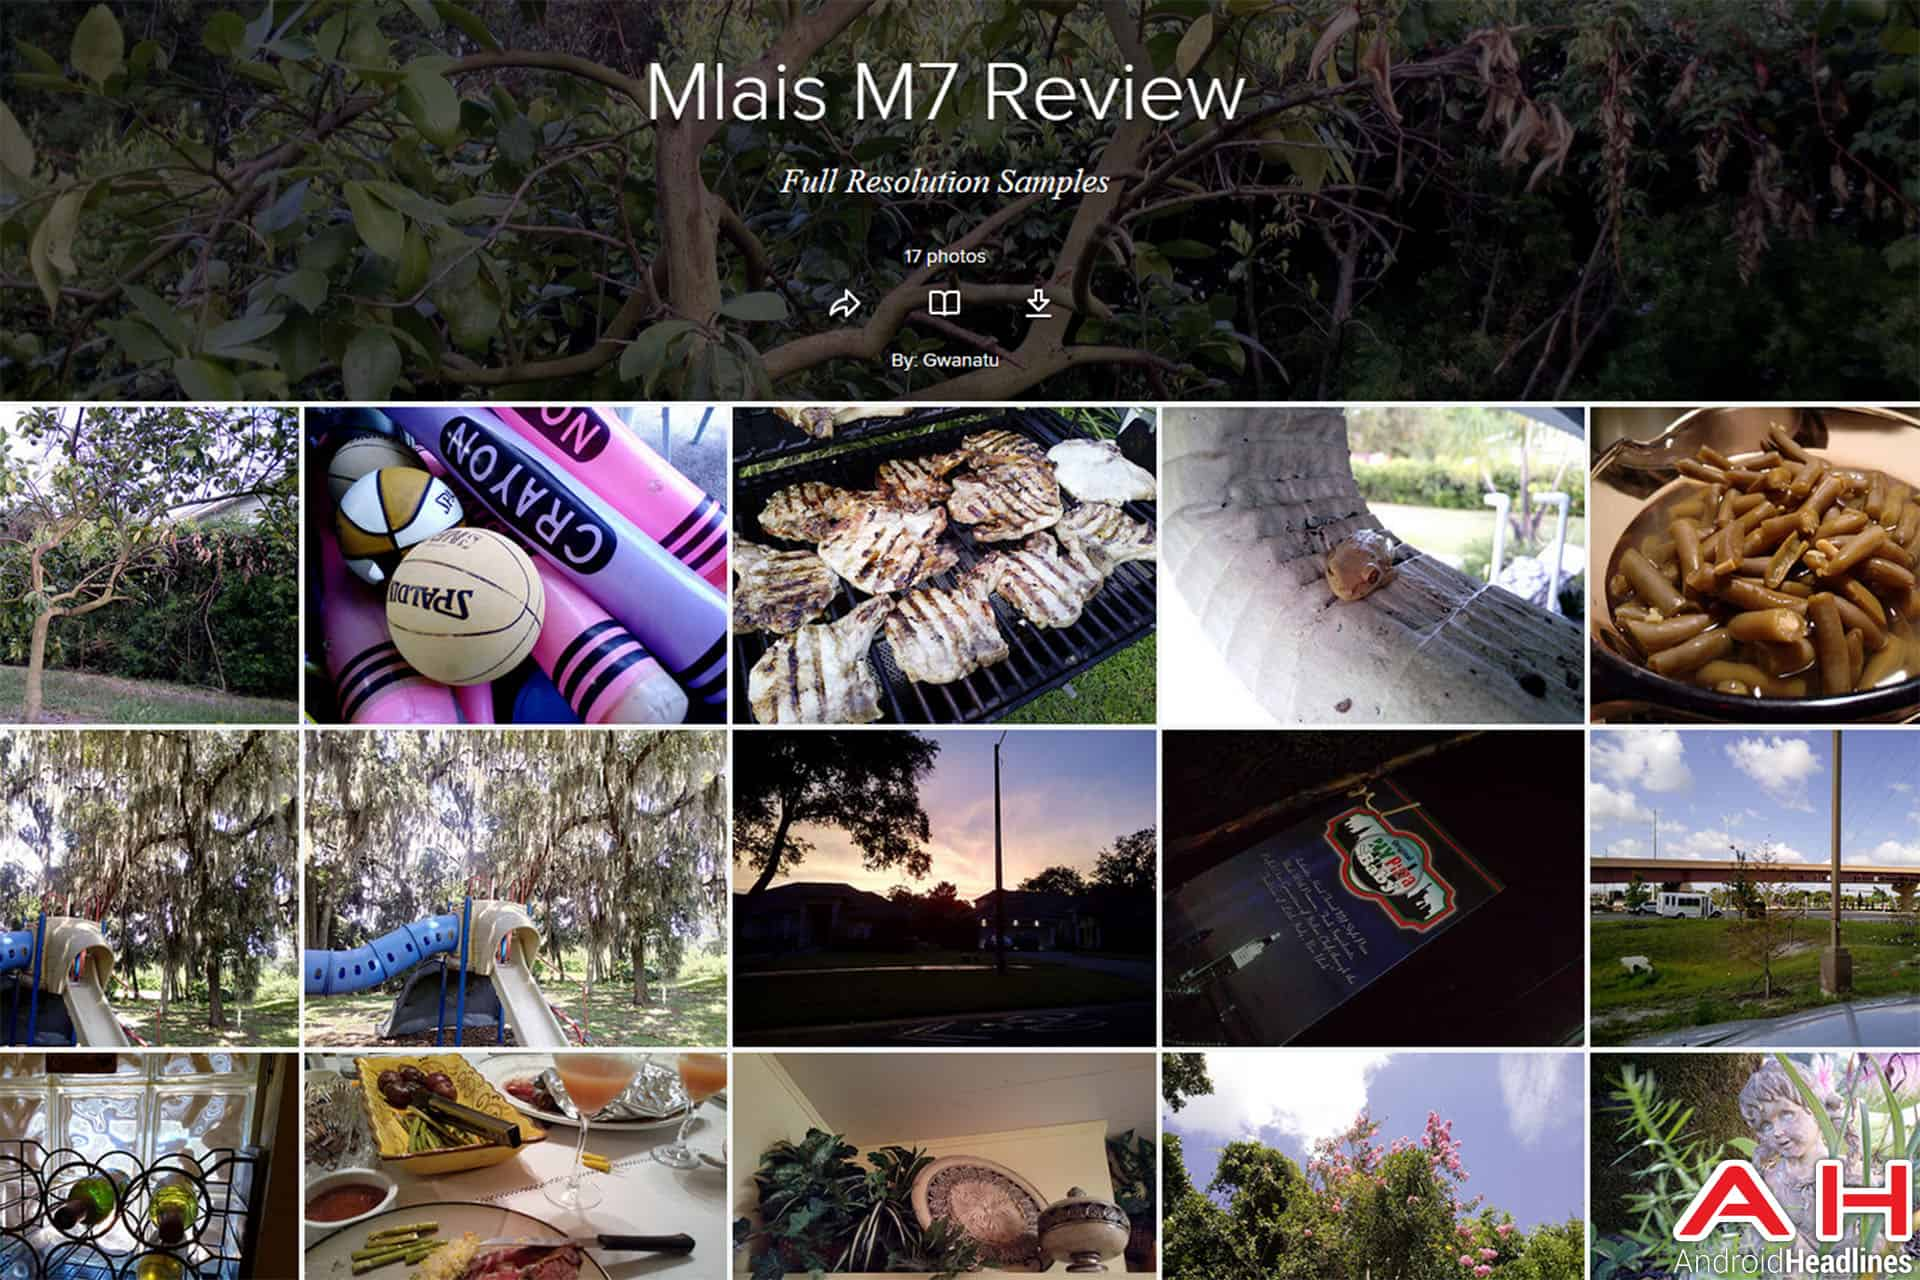 mlais-m7-AH-review-flickr